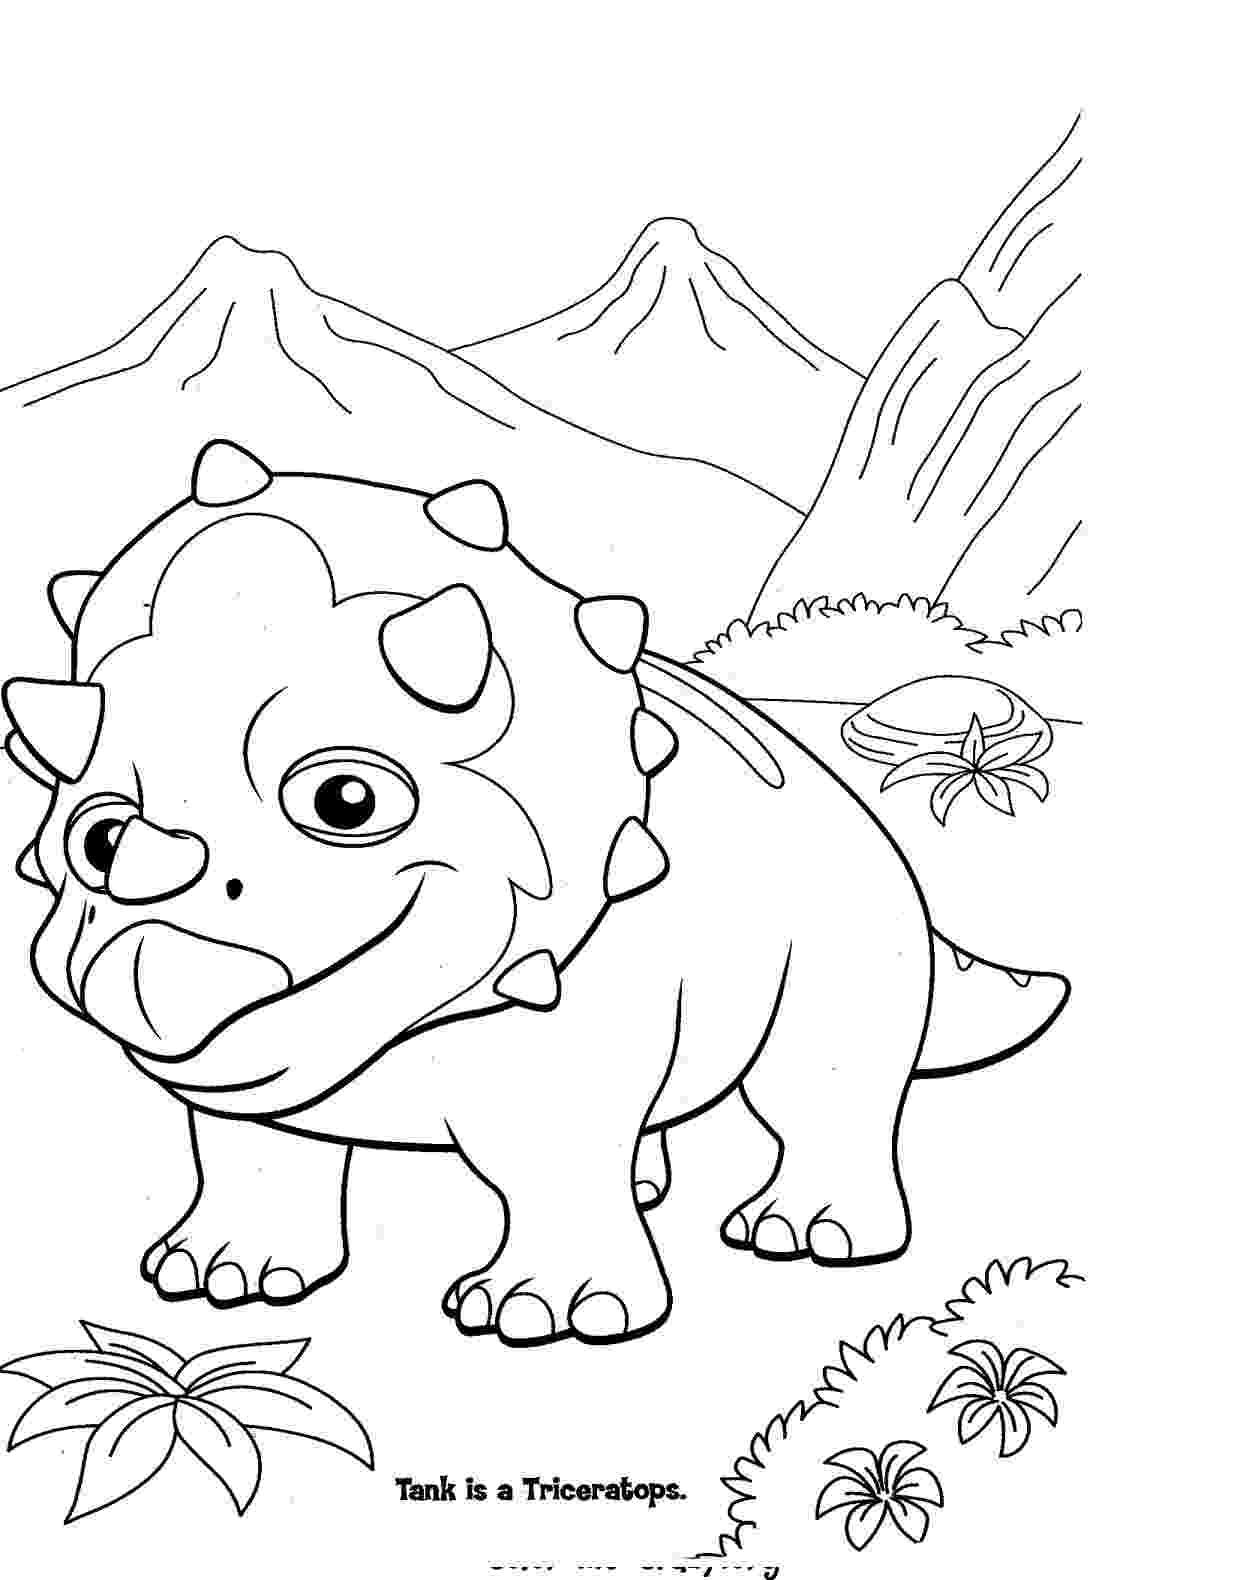 dinosaur pictures to color colormecrazyorg dinosaur train coloring pages to color pictures dinosaur